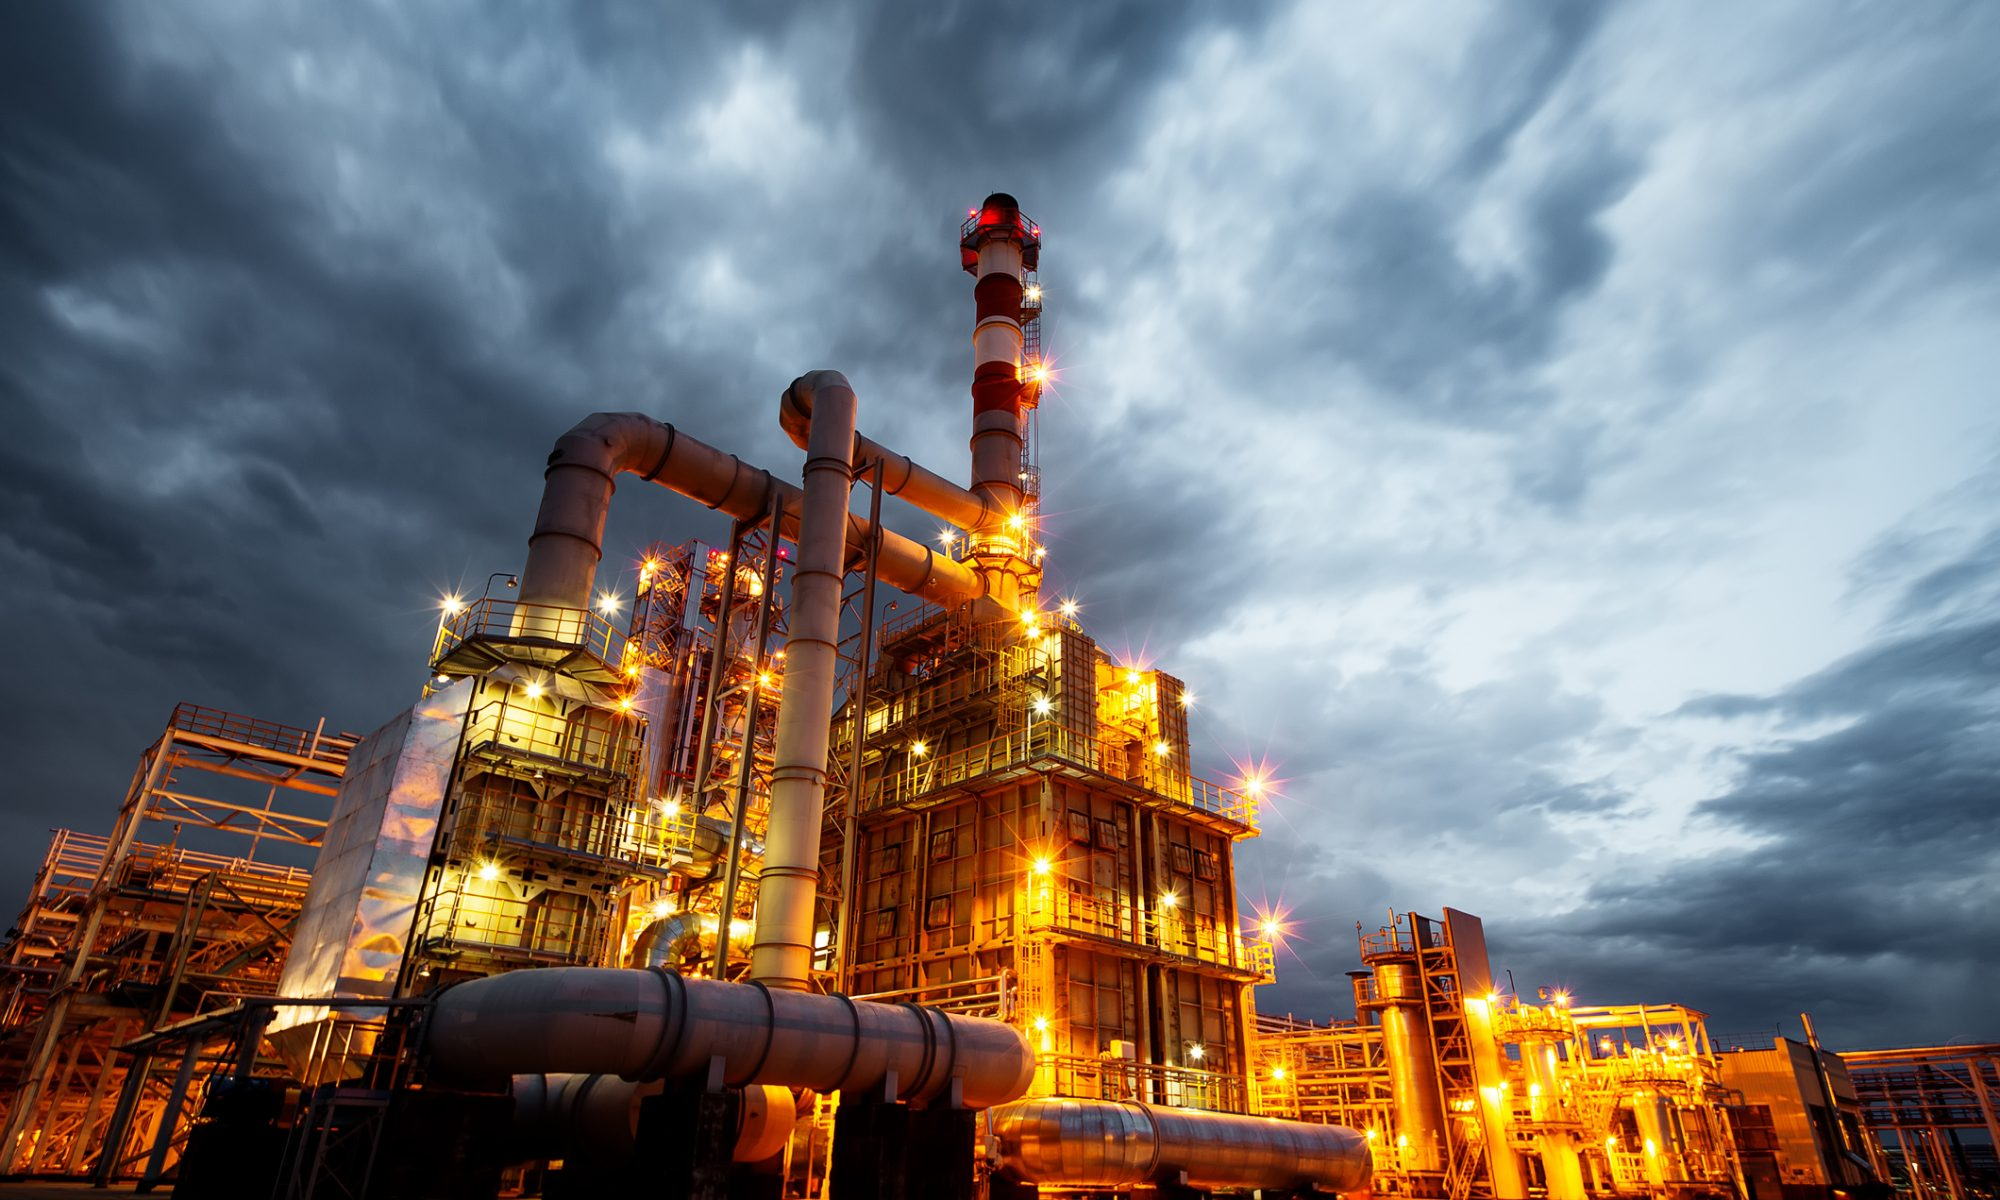 Process Industries and LPWAN